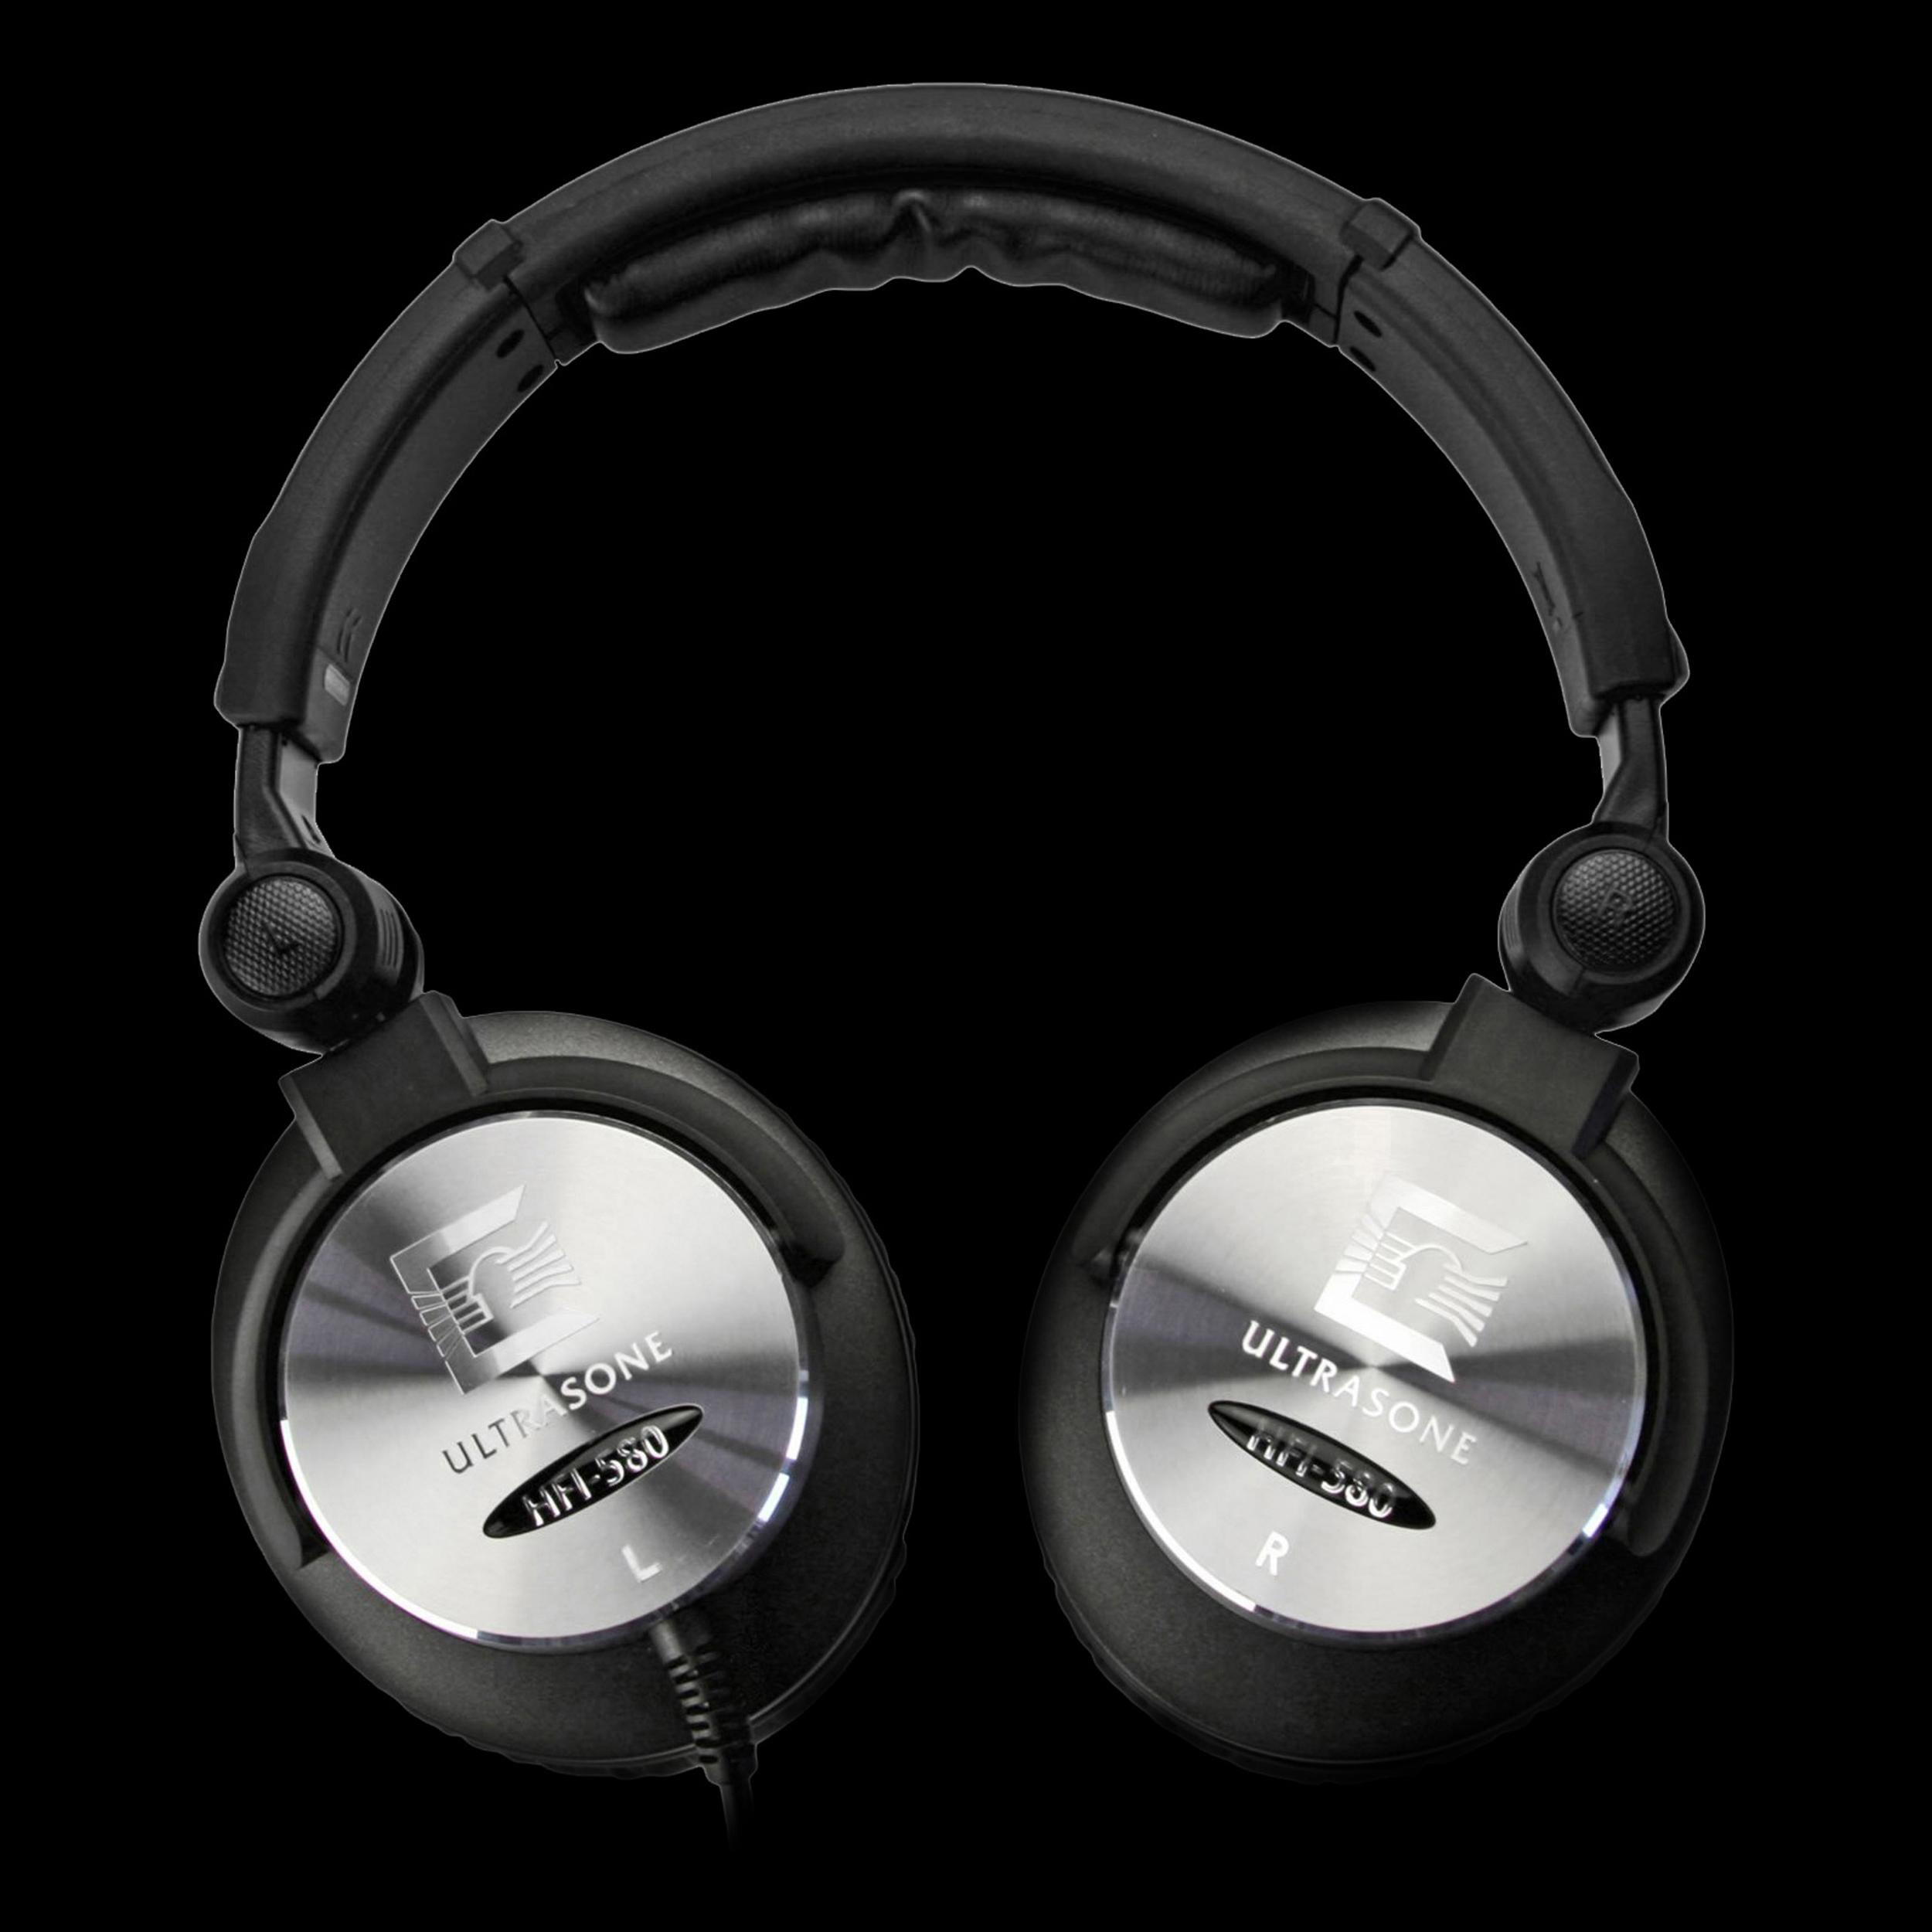 ultrasone hfi 580 professional headphones ebay. Black Bedroom Furniture Sets. Home Design Ideas